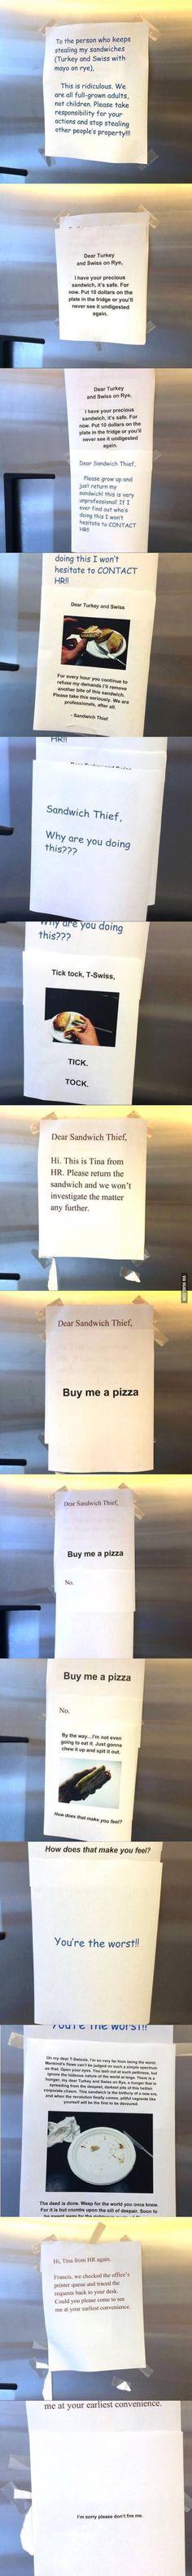 Passive agressive work place!